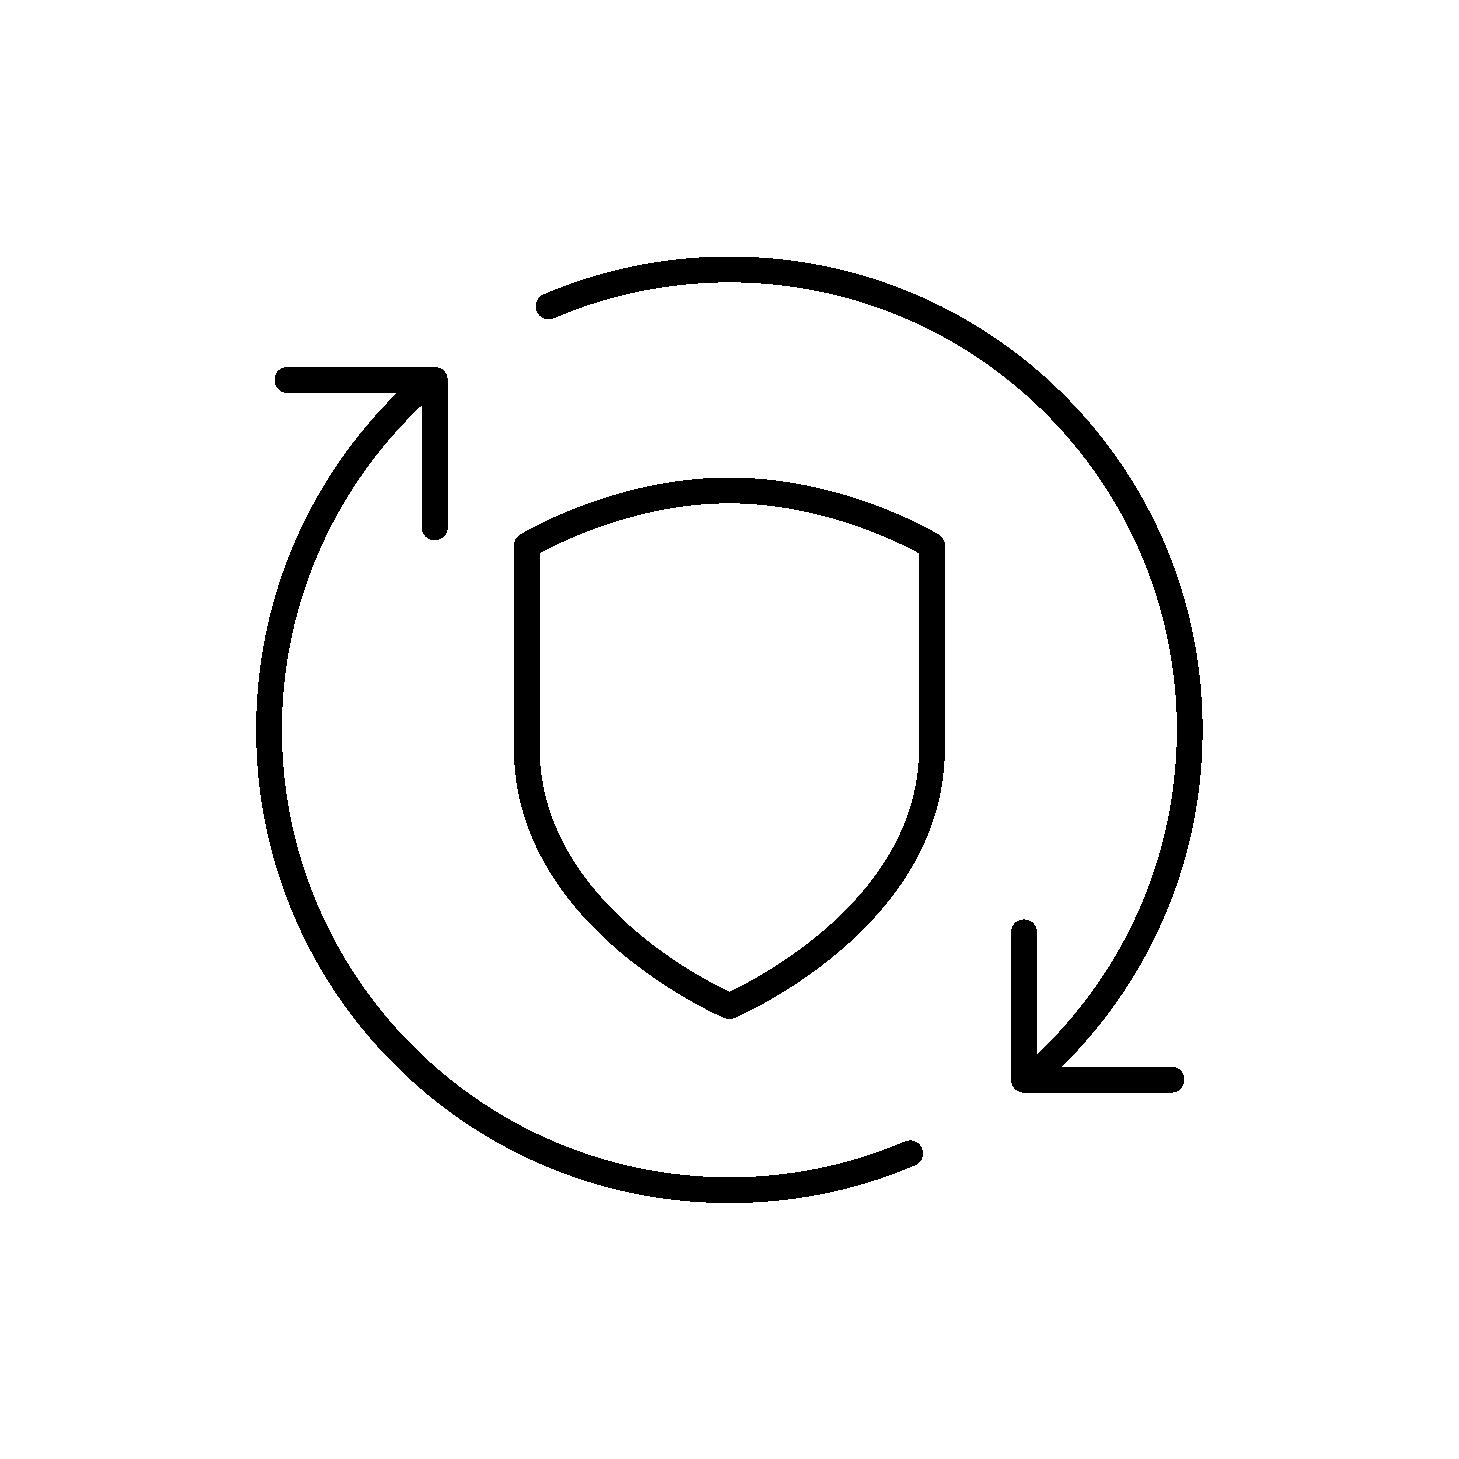 Icon-Cyber-Shield Loading-Black